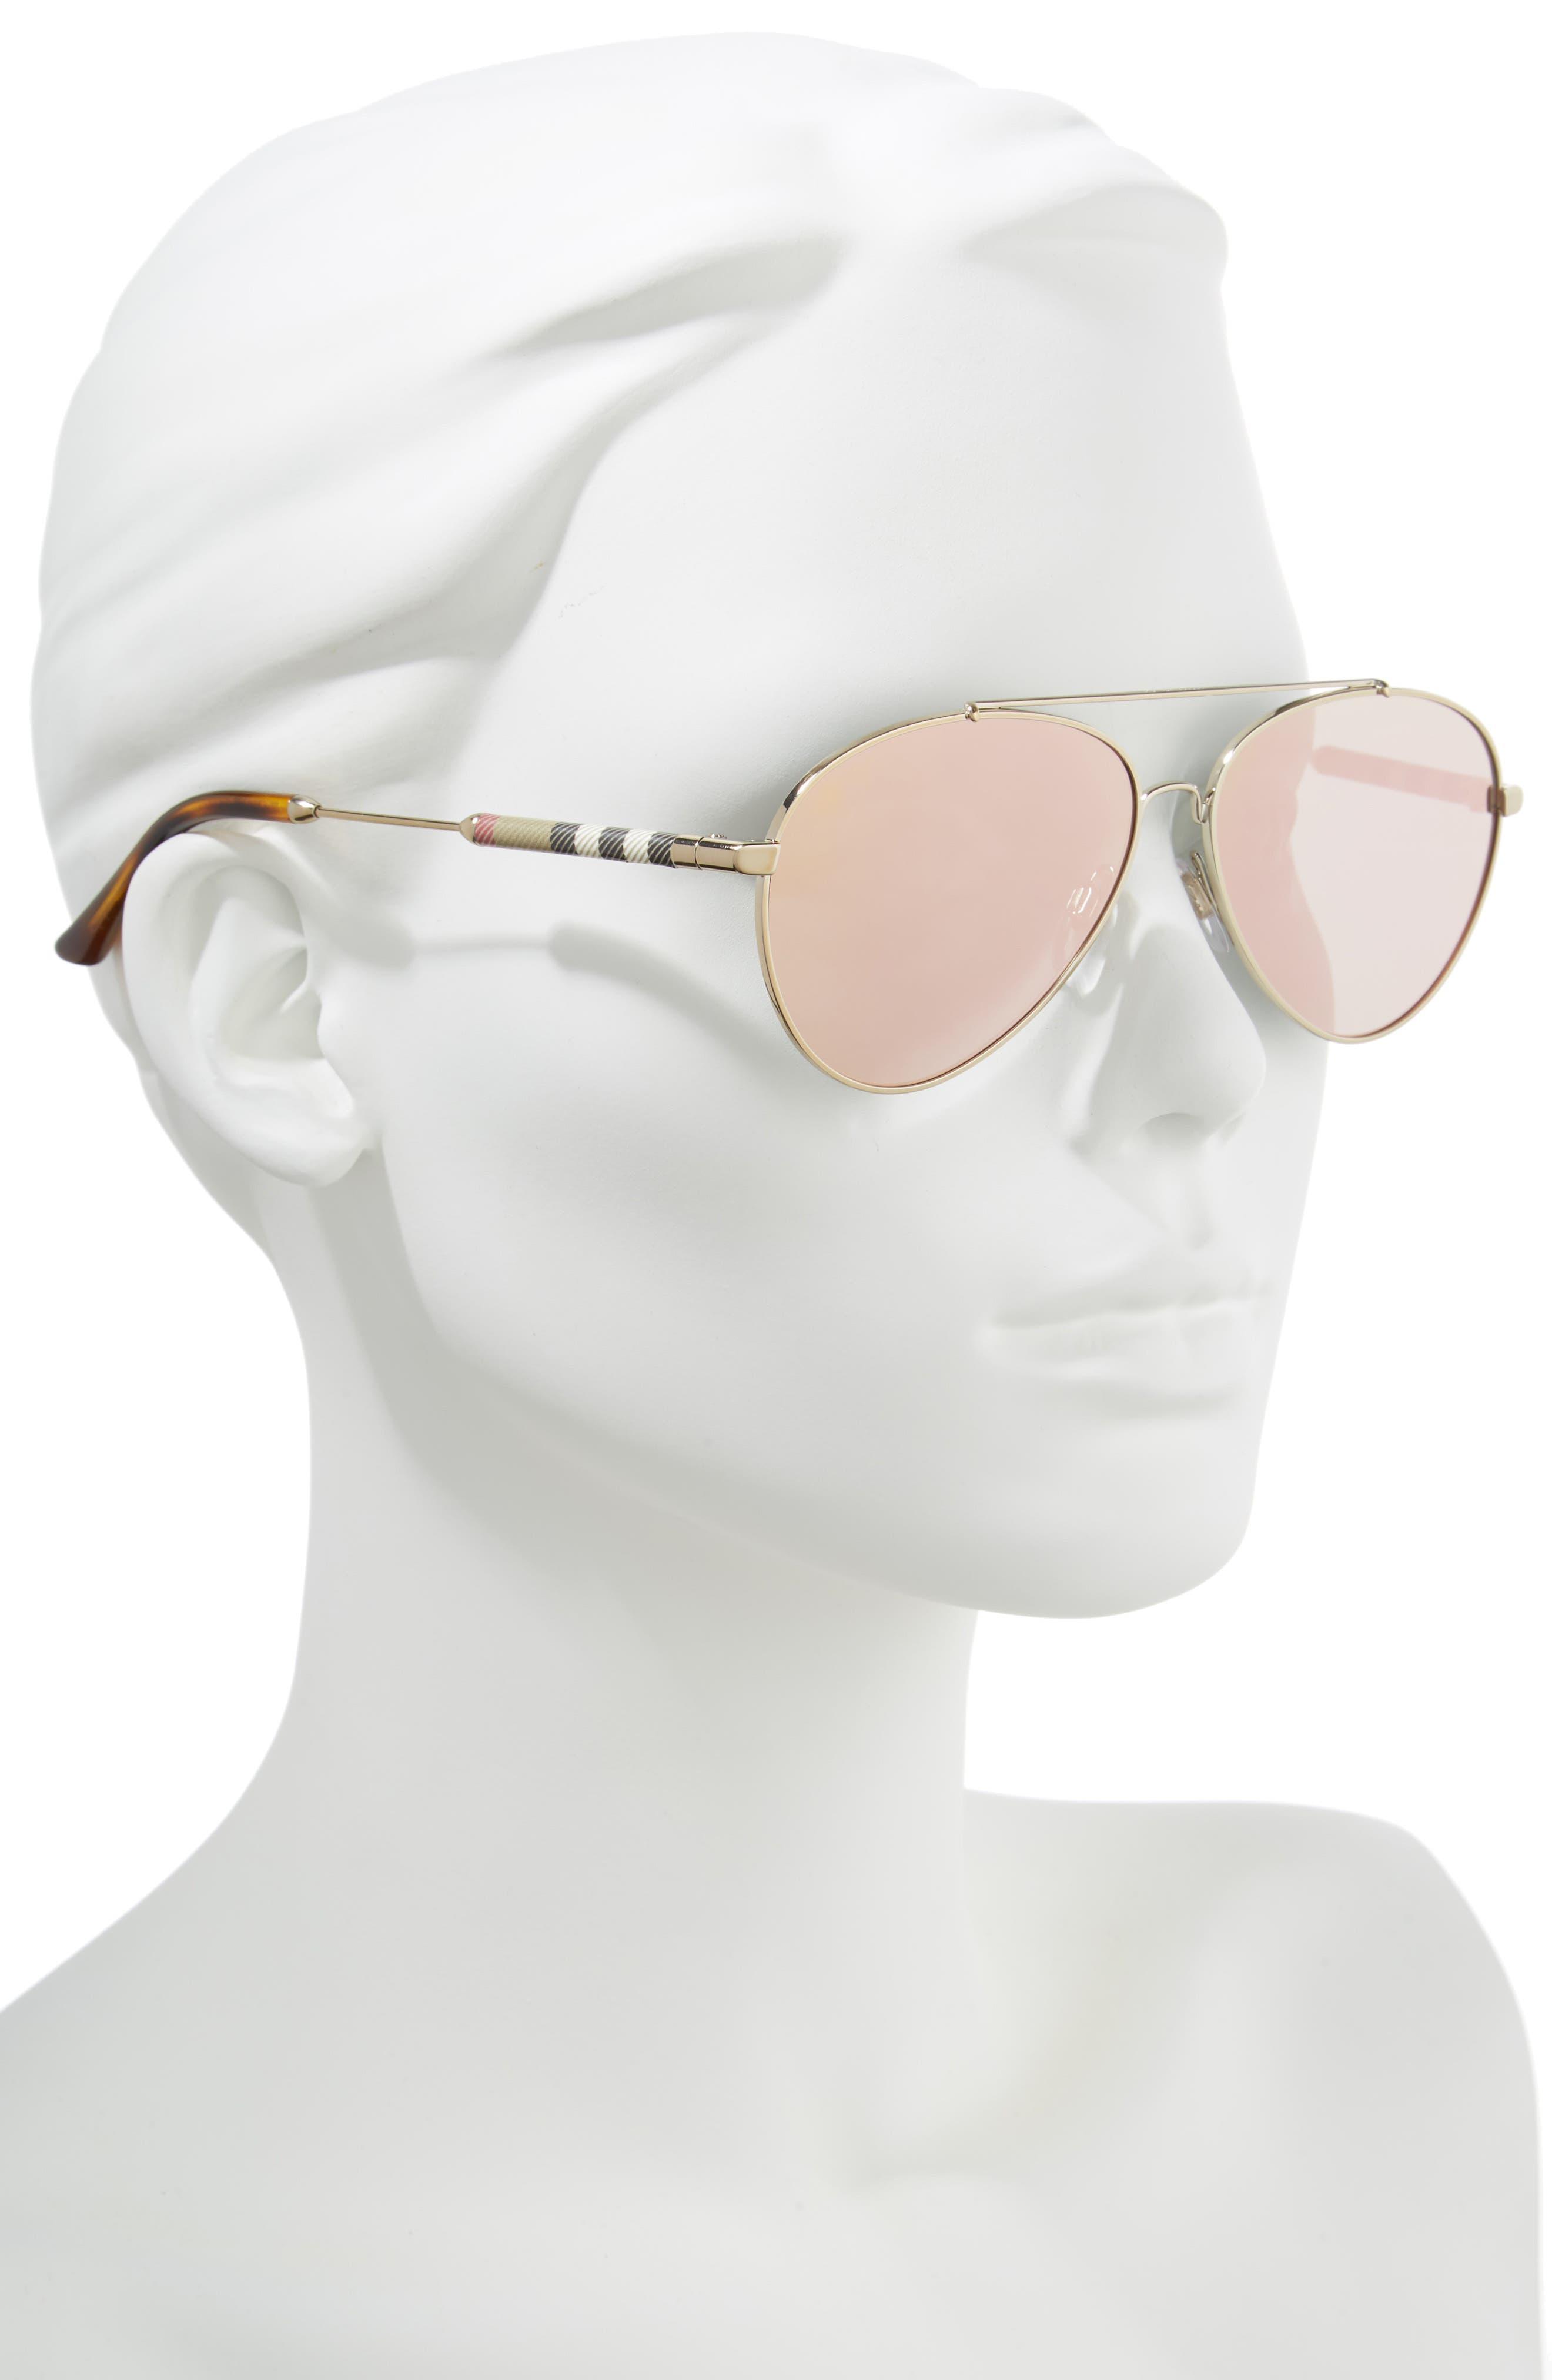 57mm Mirrored Aviator Sunglasses,                             Alternate thumbnail 2, color,                             031